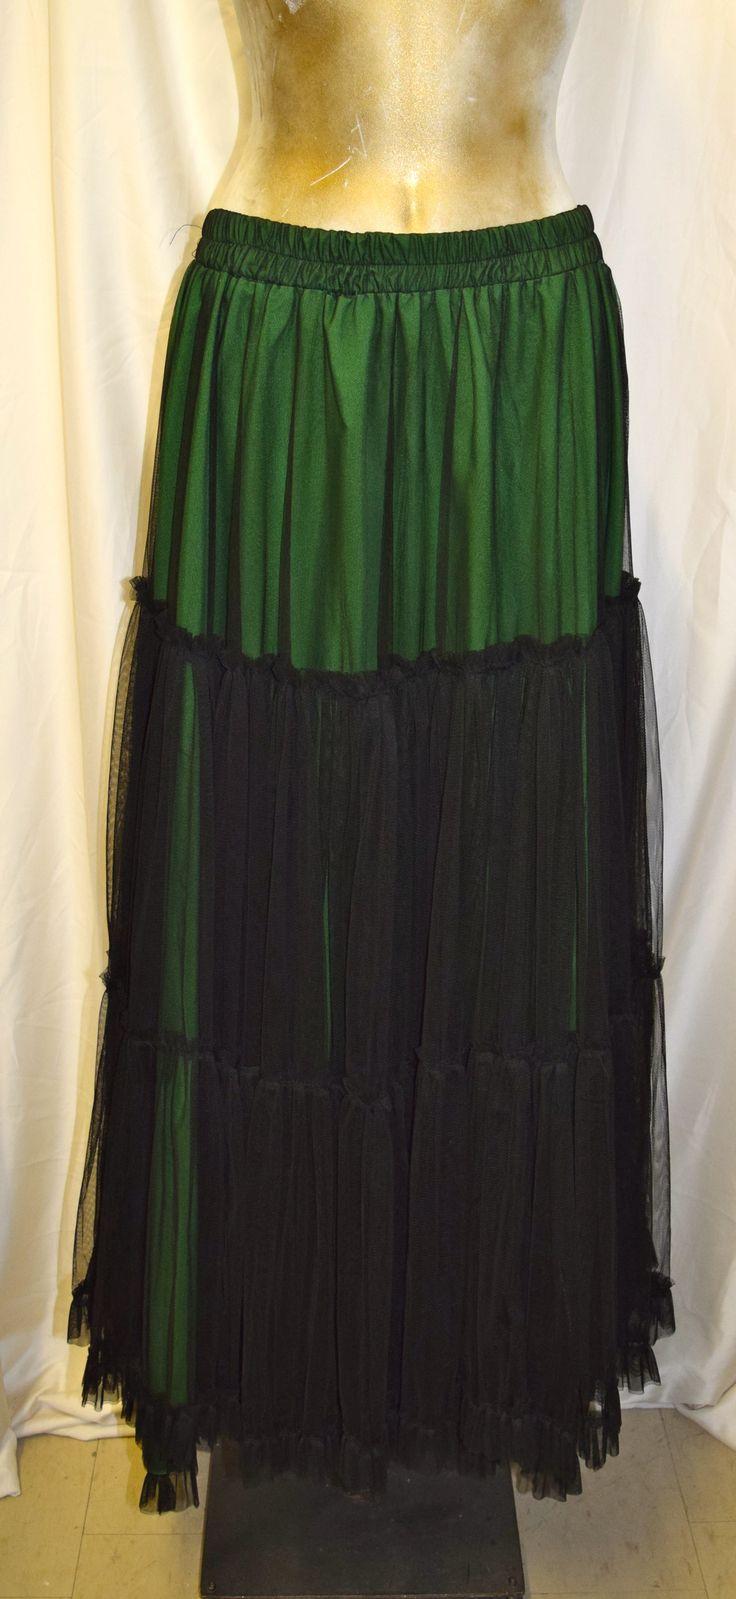 Black & Emerald Green Long Skirt